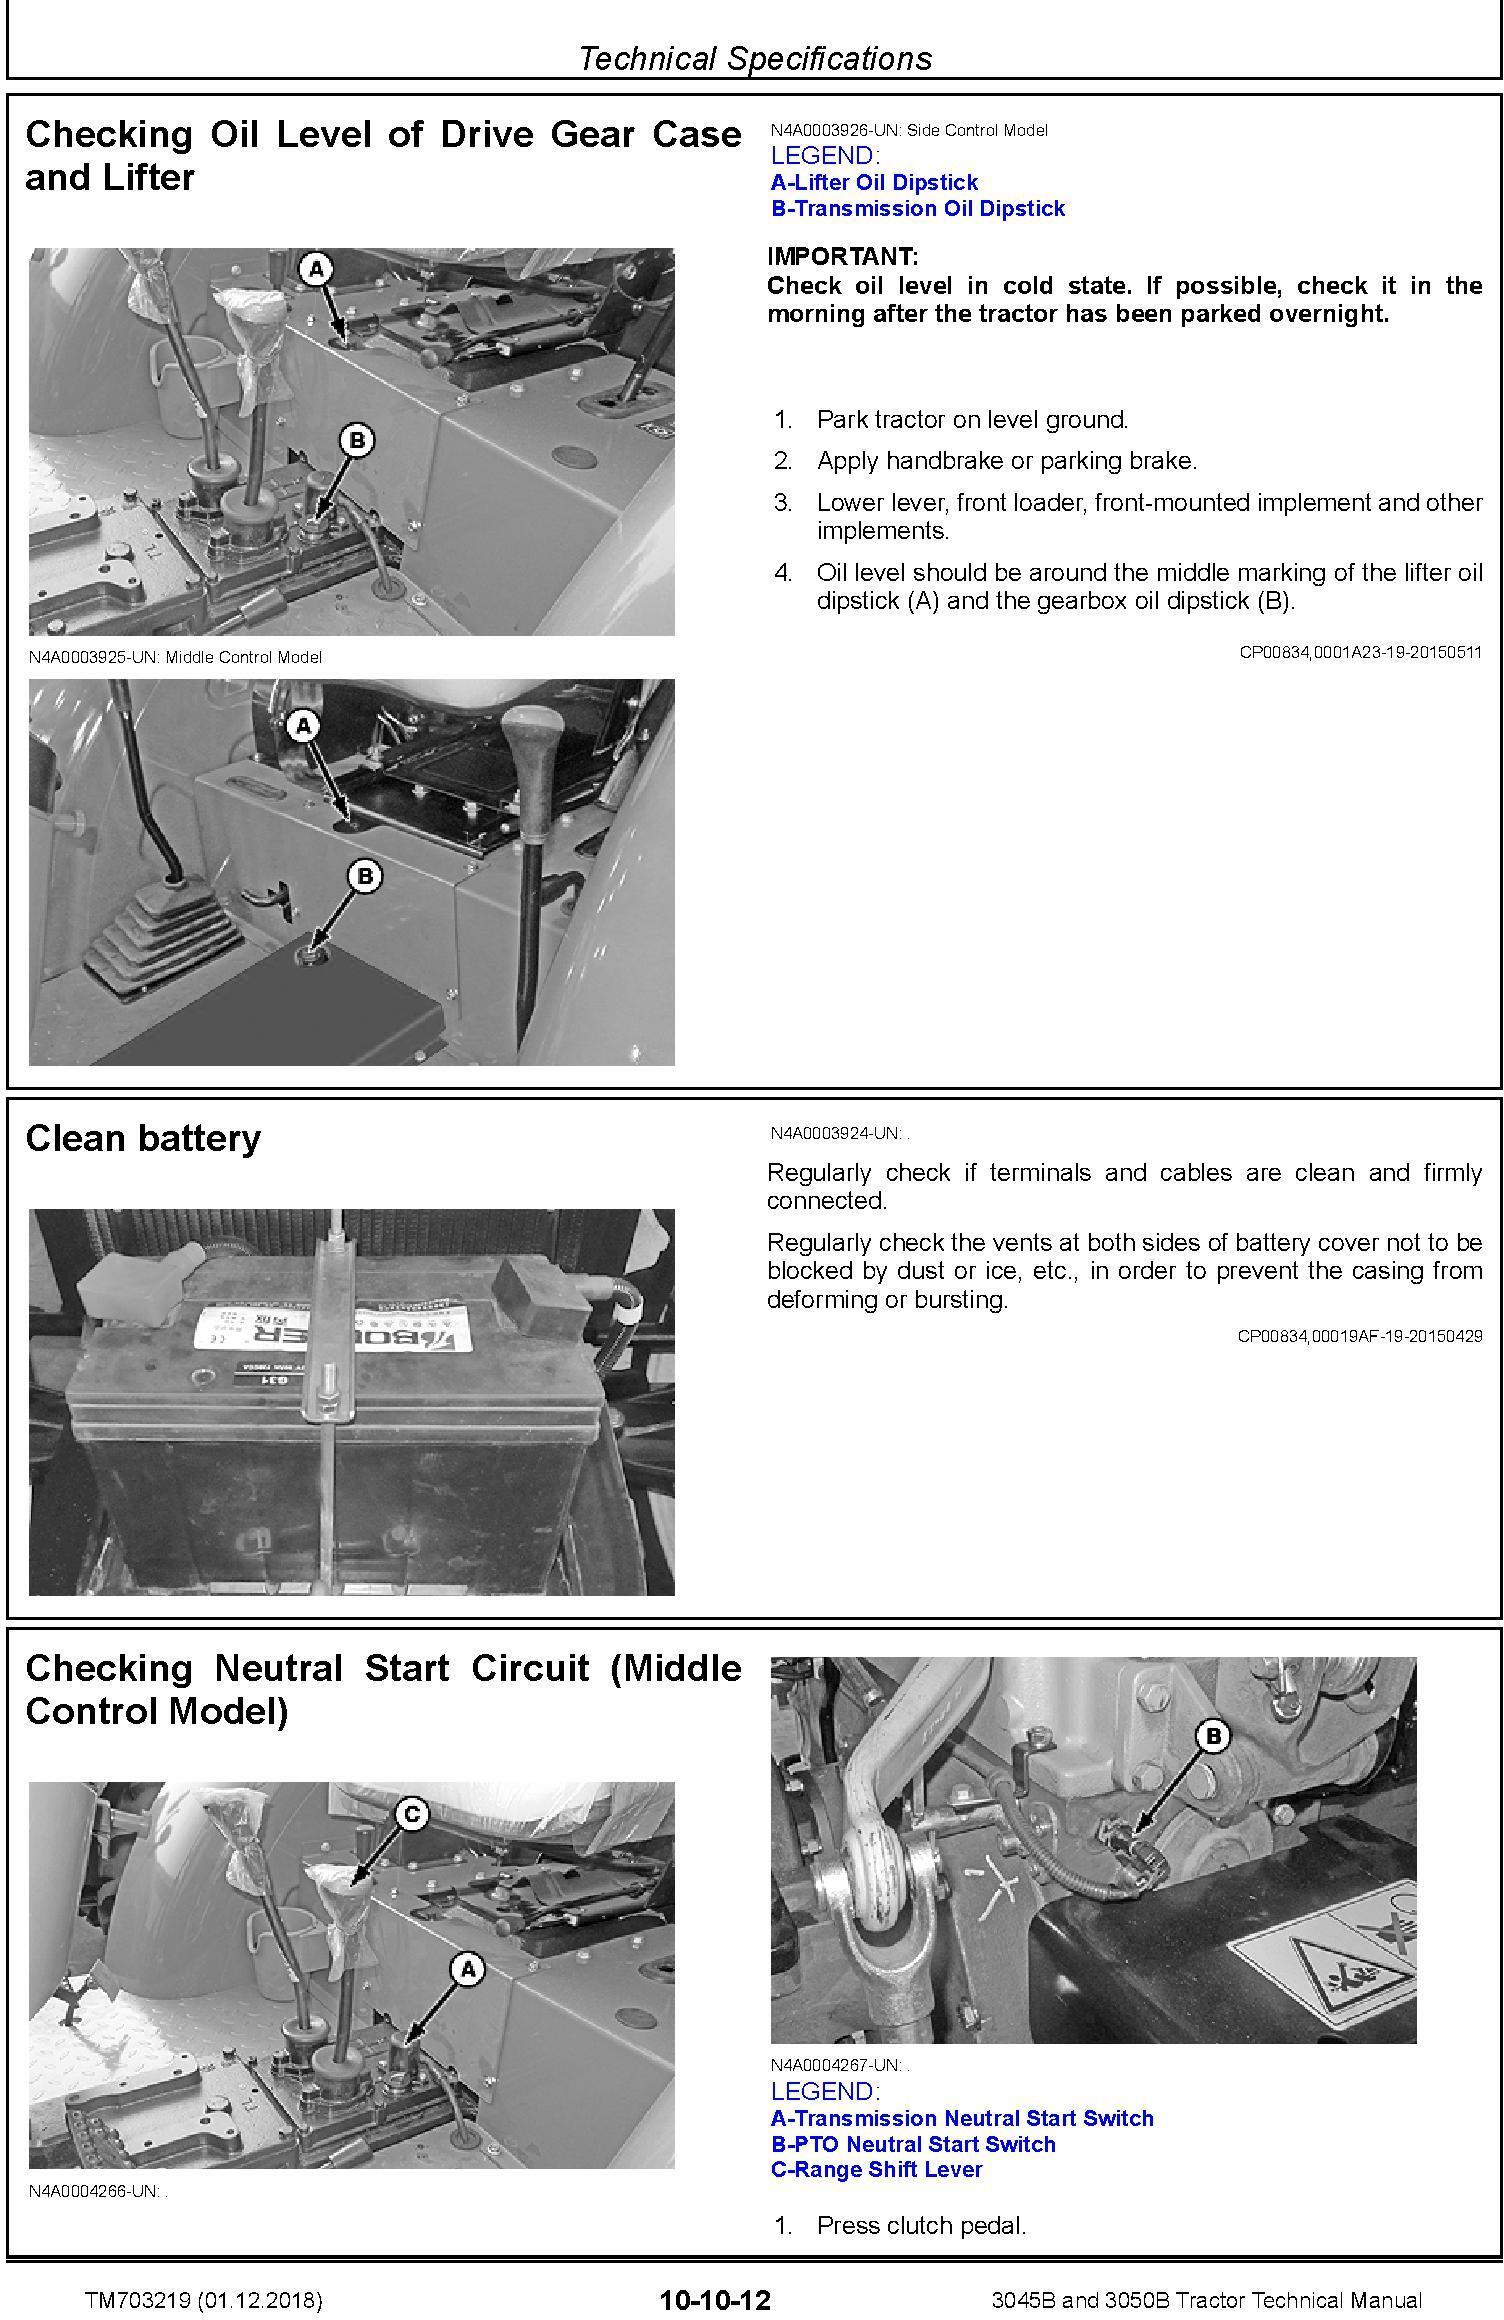 John Deere 3045B and 3050B Tractors Technical Service Manual (TM703219) - 1